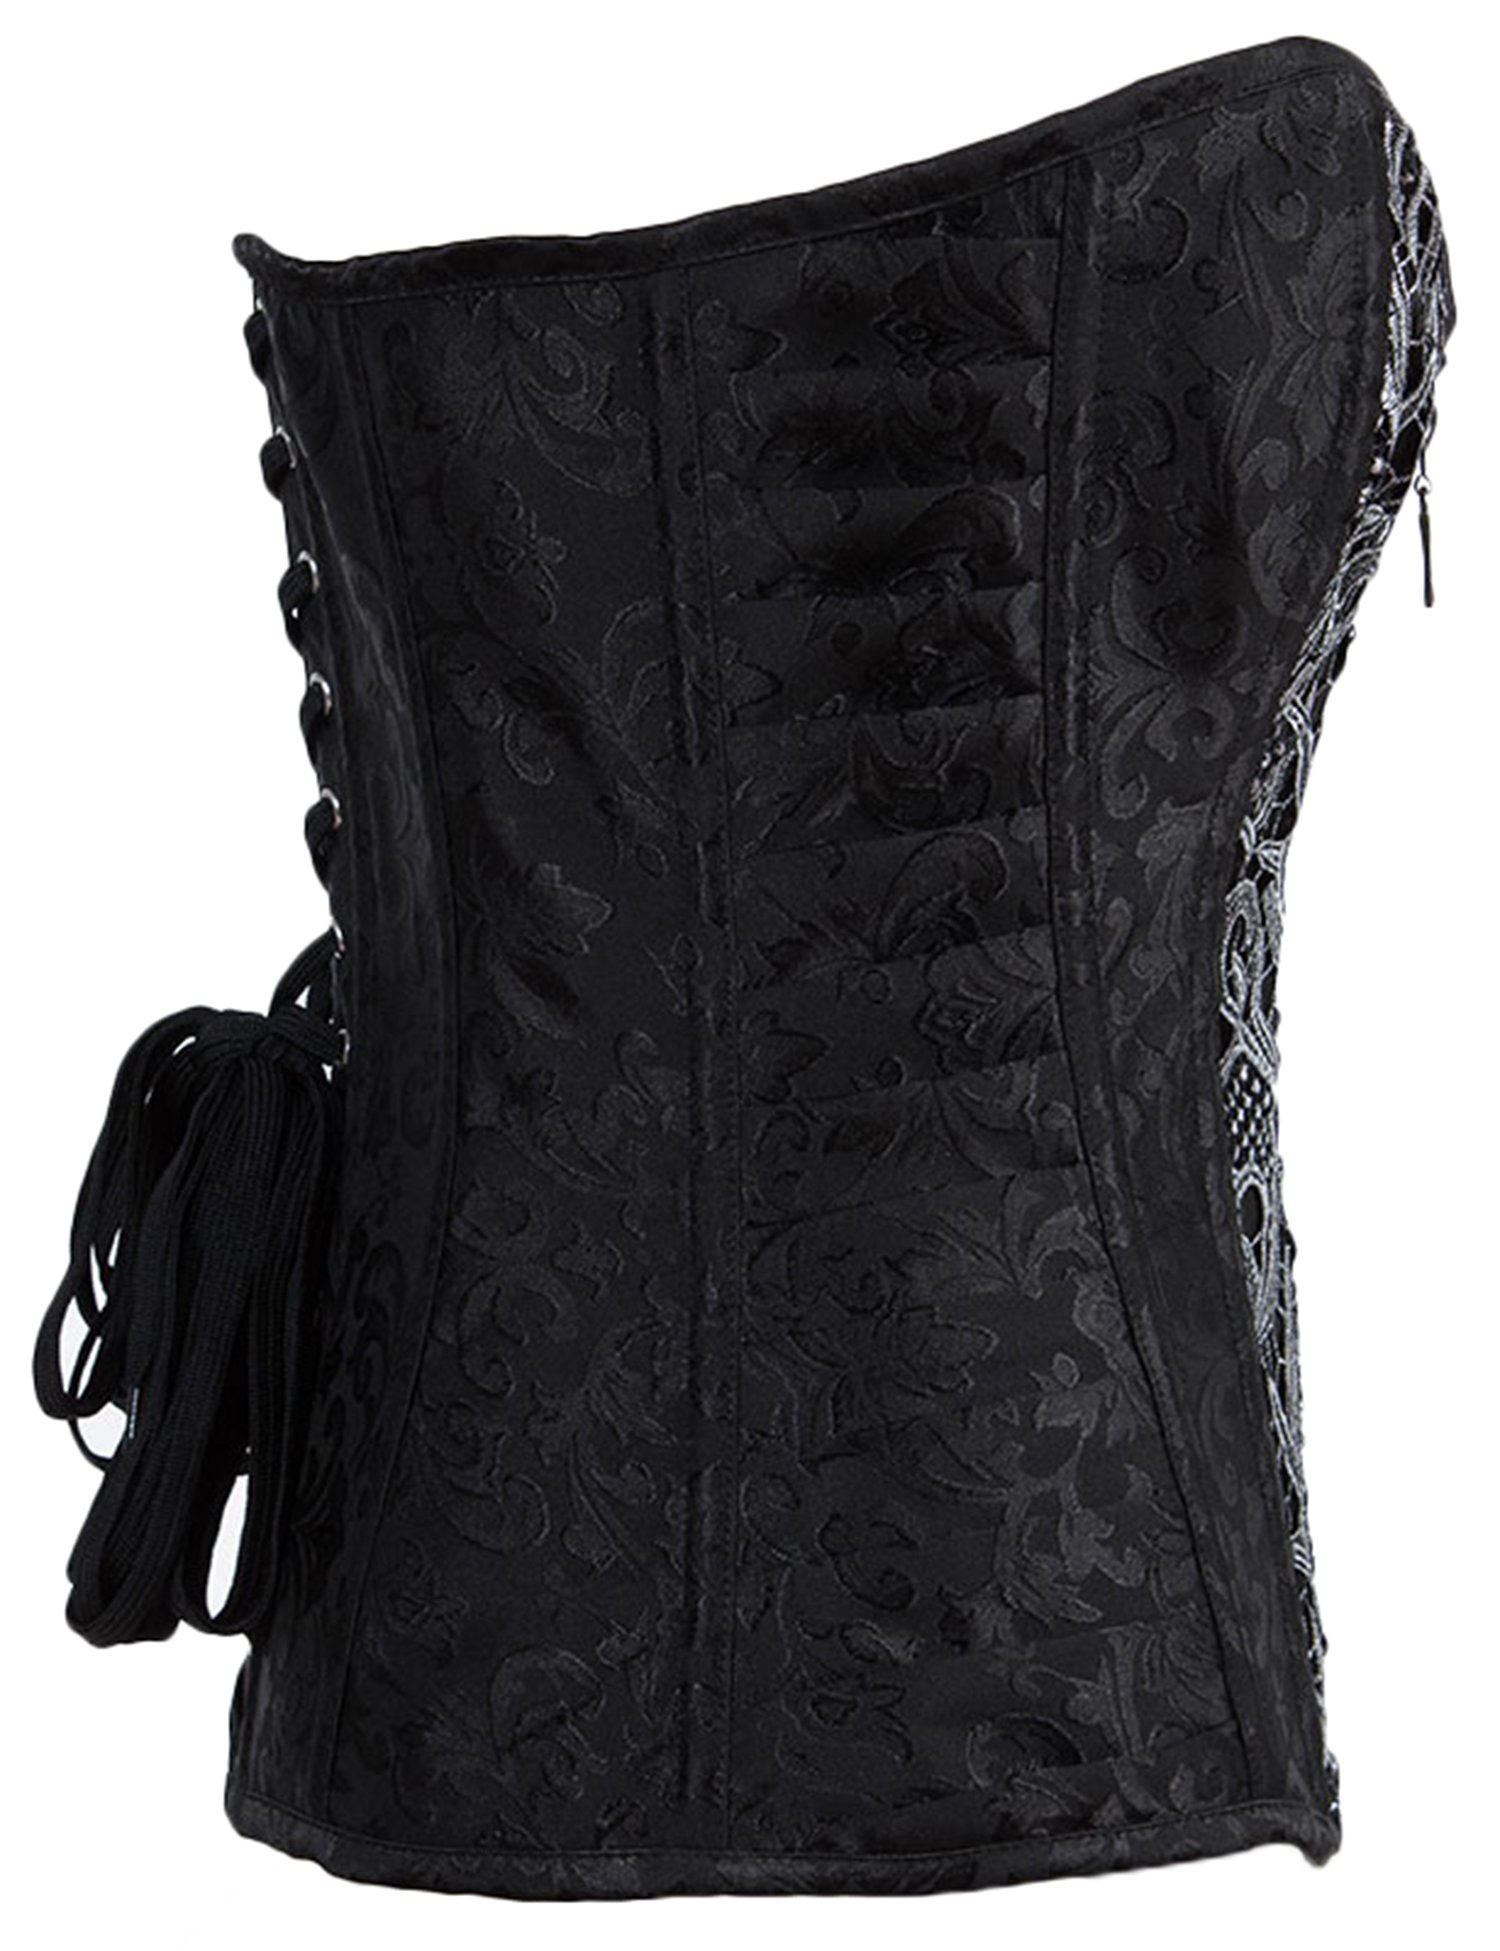 Alivila.Y Fashion Womens Sexy Steampunk Gothic Steel Boned Vintage Corset 5